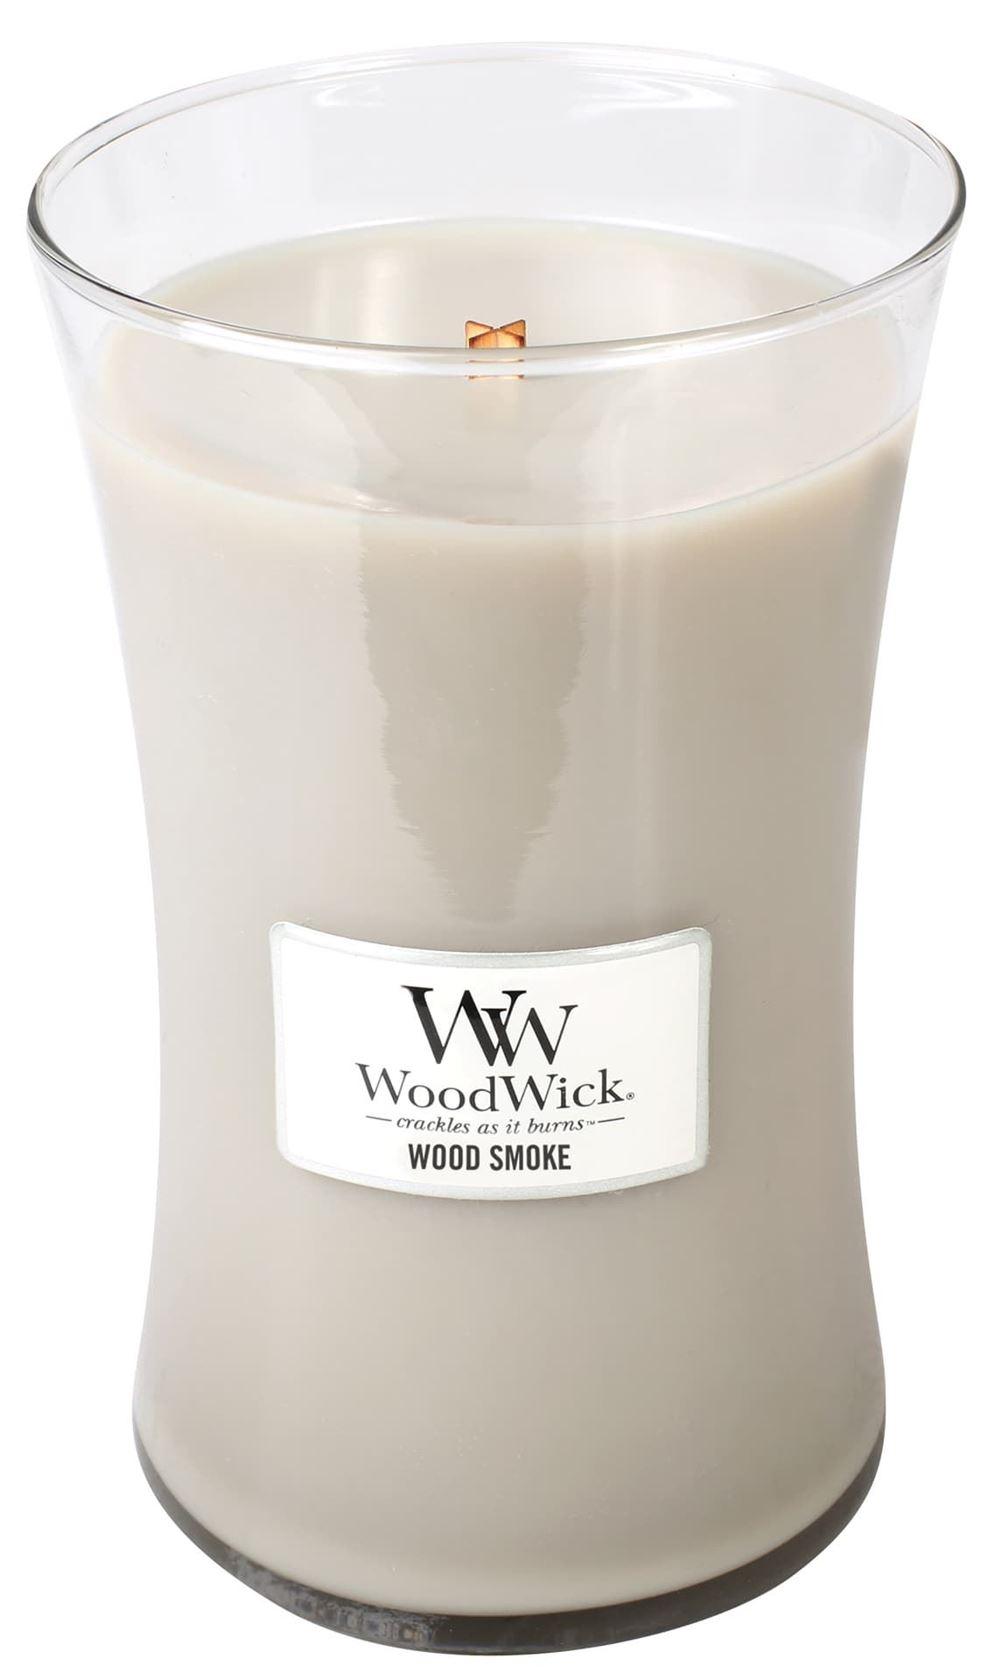 Woodwick-Large-Hourglass-Candle-Wood-Smoke-Geurkaars